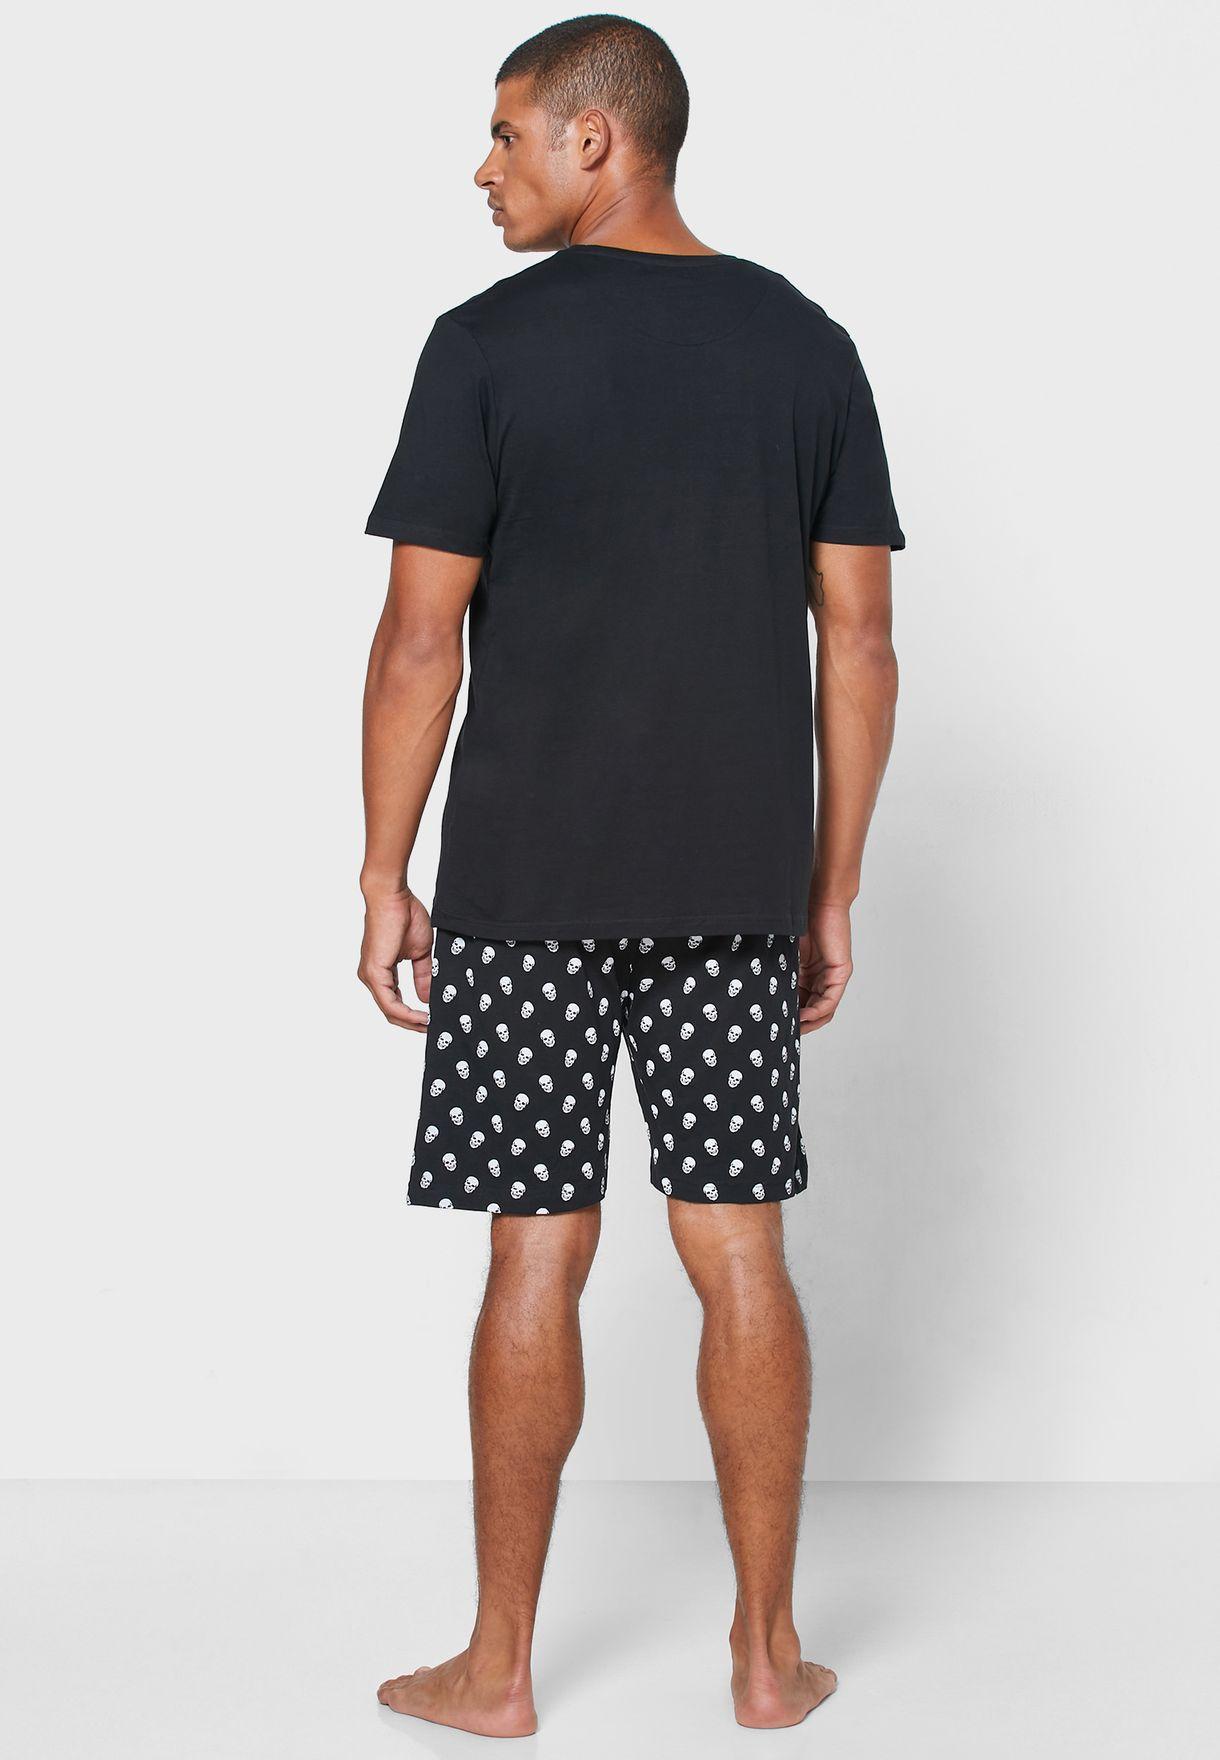 Pocket Detail Nightwear Set